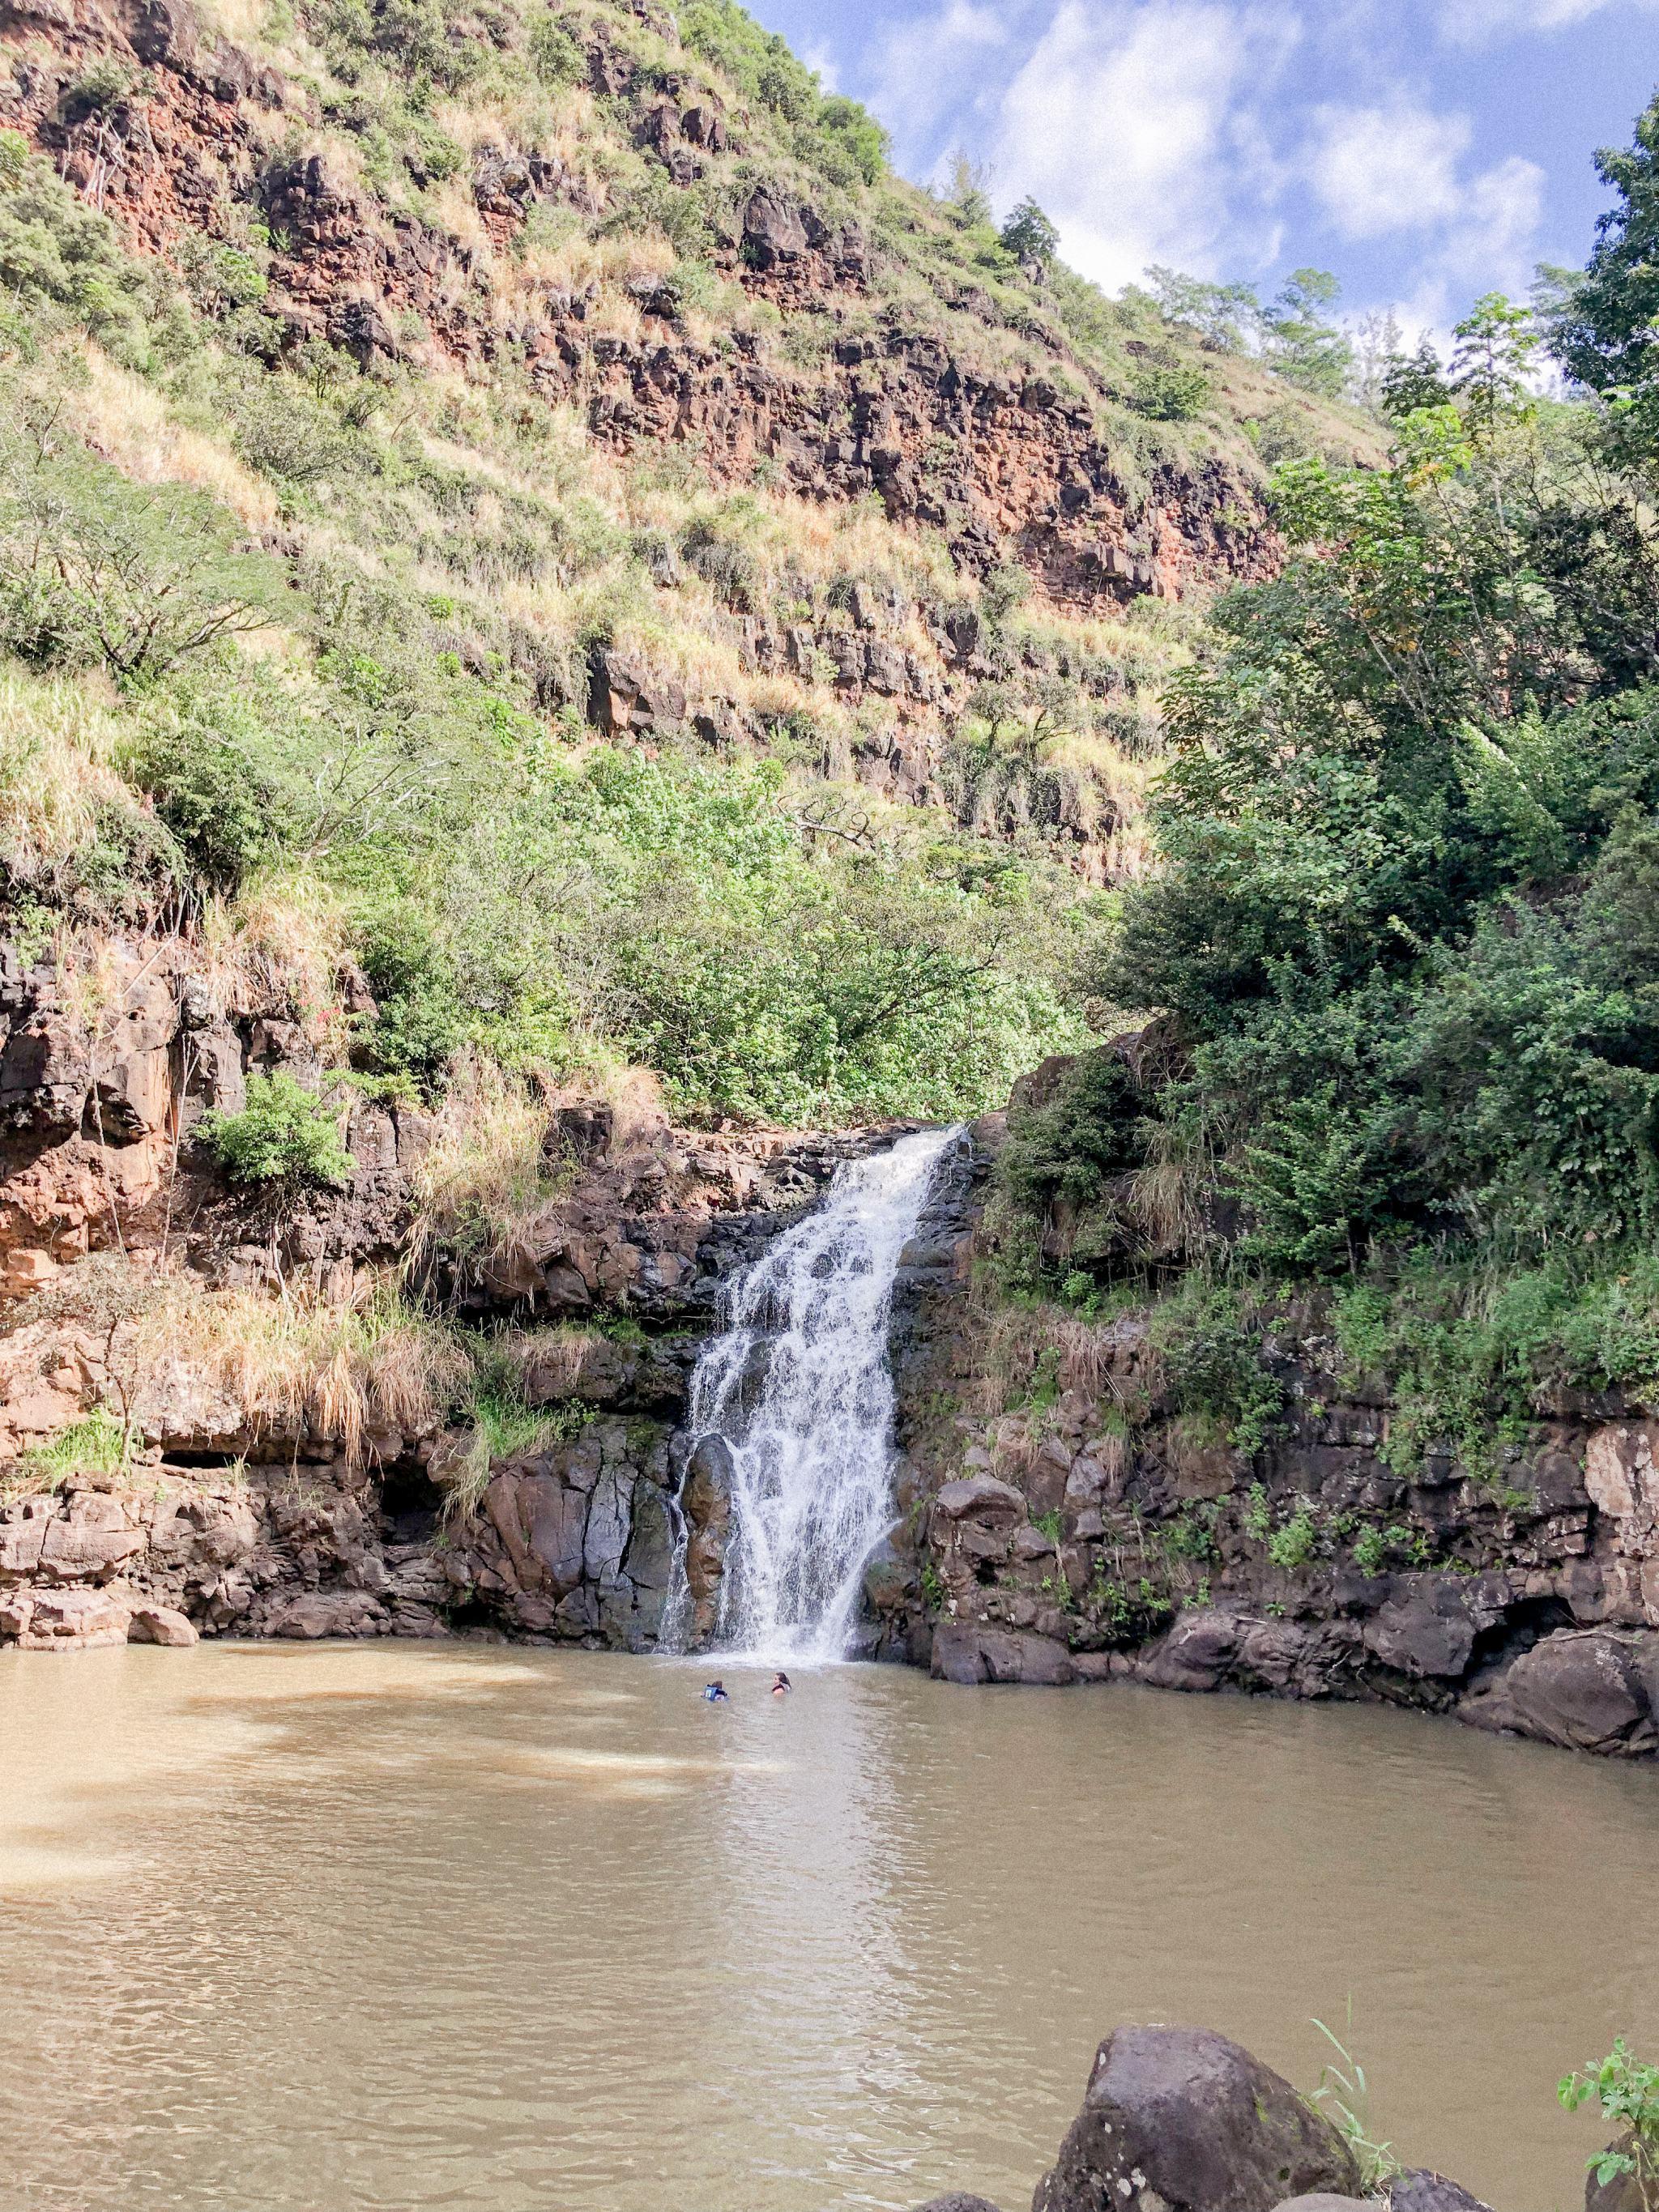 Hiking in Hawaii - Best Hikes in Hawaii - Hiking in Honolulu Hawaii - Best Trails in Hawaii - Hawaii Hiking Trails - Hawaii Hikes Oahu - Waimea Valley Trail Oahu - Kid Friendly Hikes - Hiking with Kids Hawaii - Waimea Falls